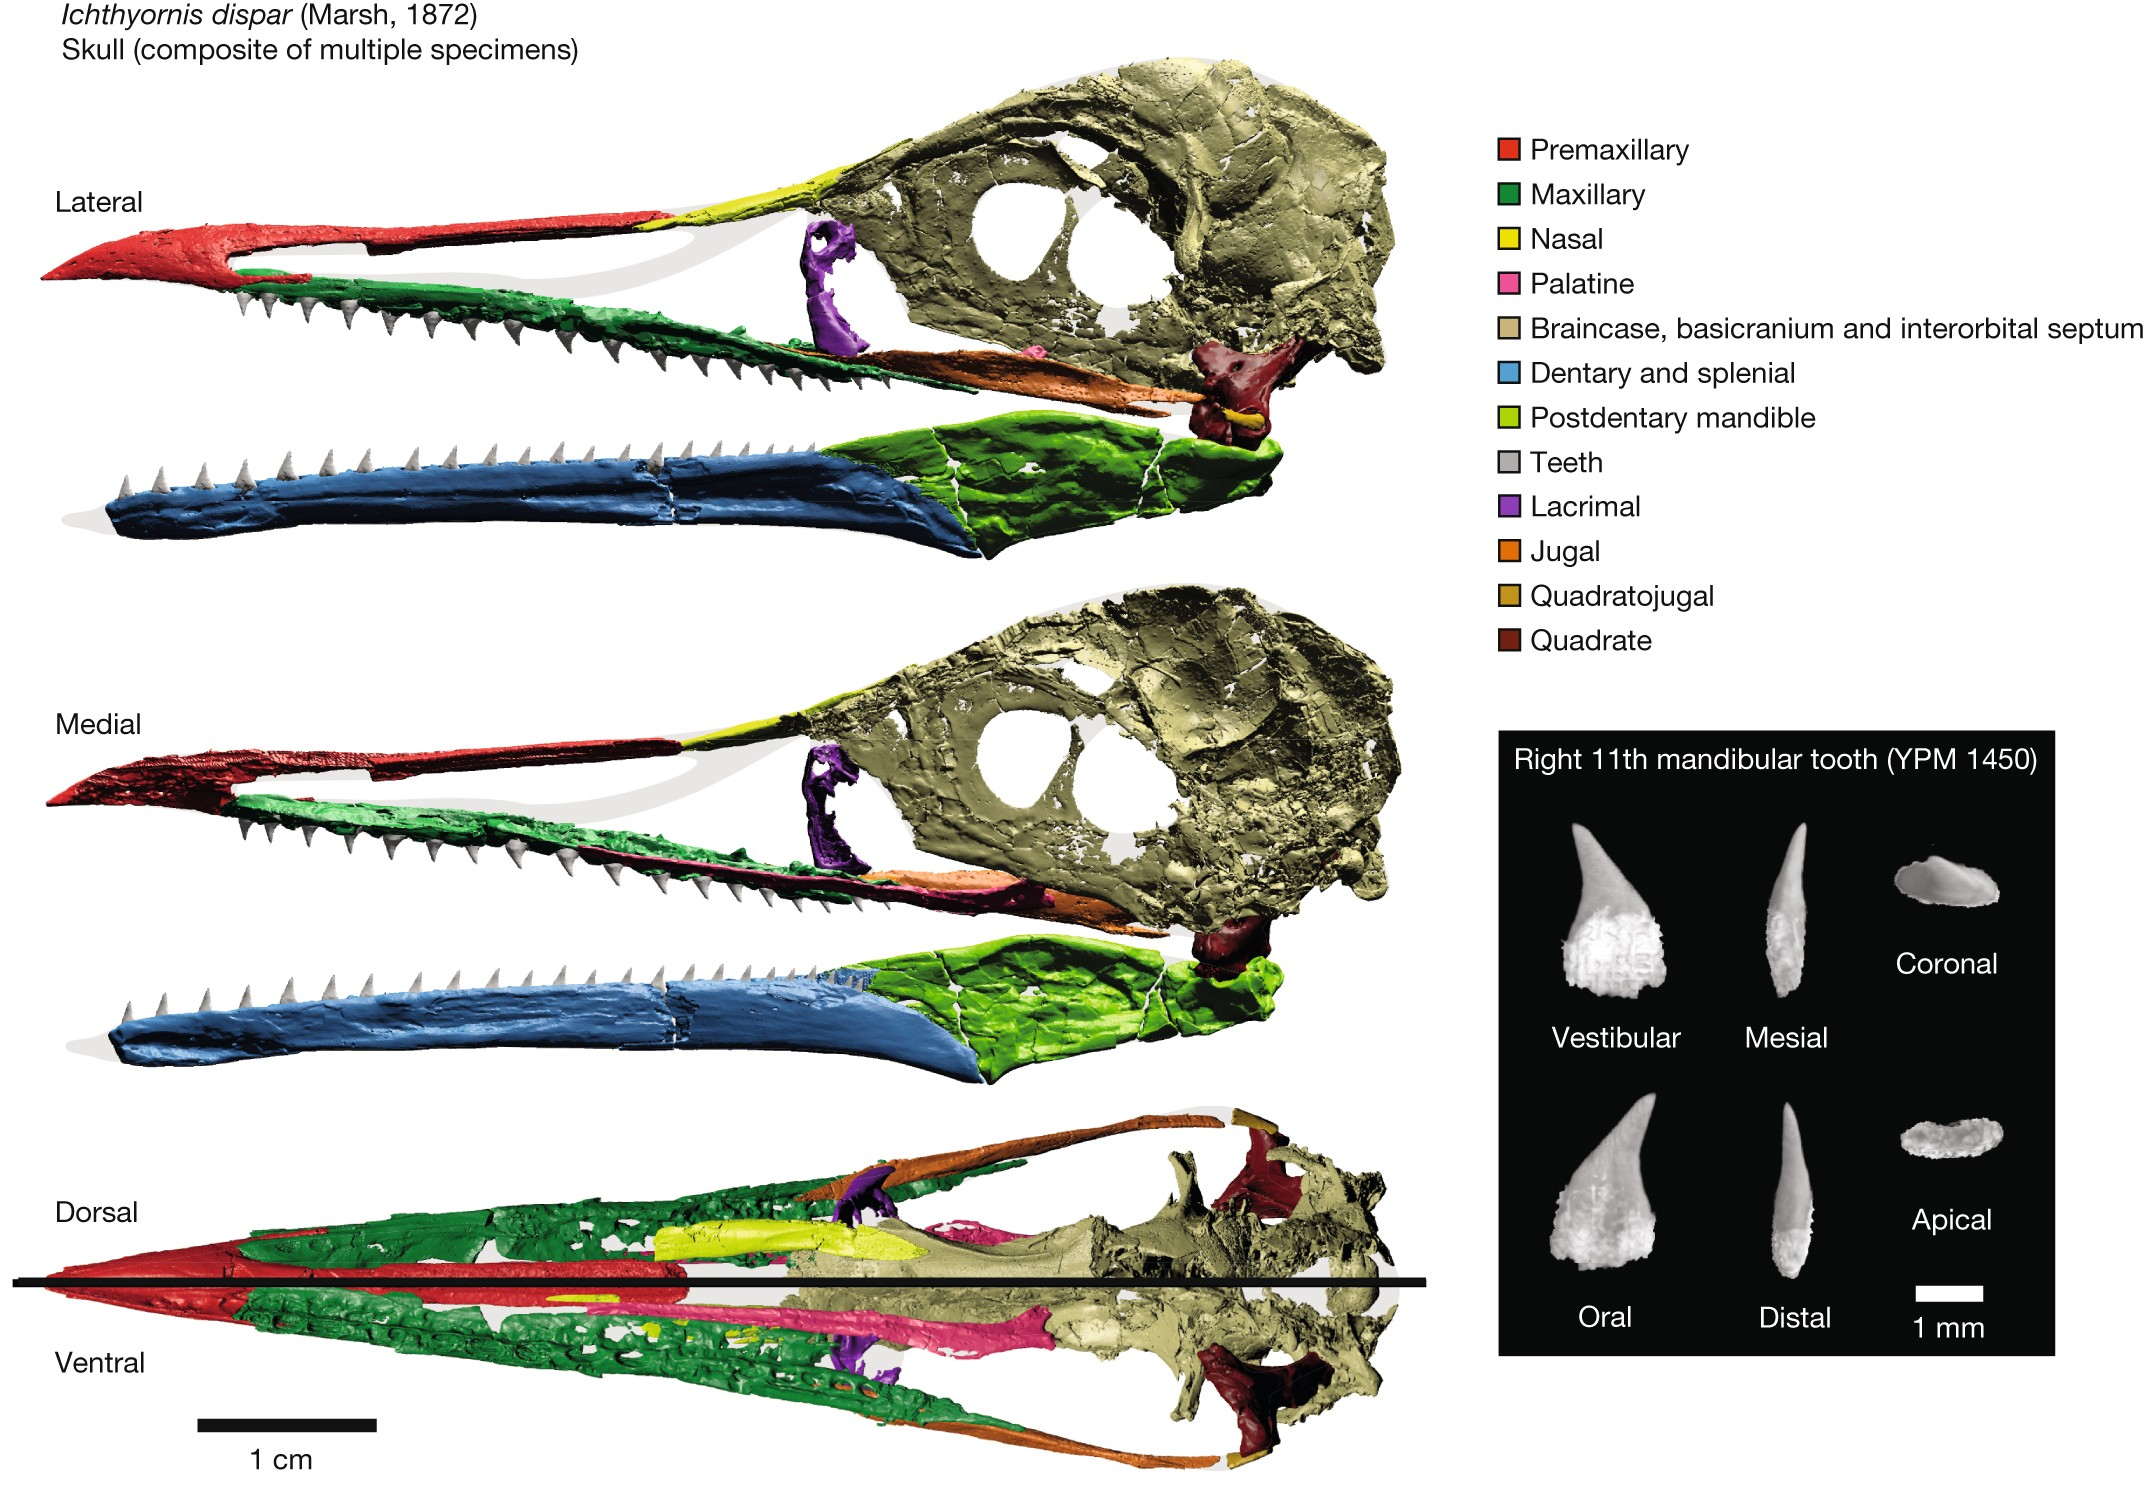 Complete Ichthyornis Skull Illuminates Mosaic Assembly Of